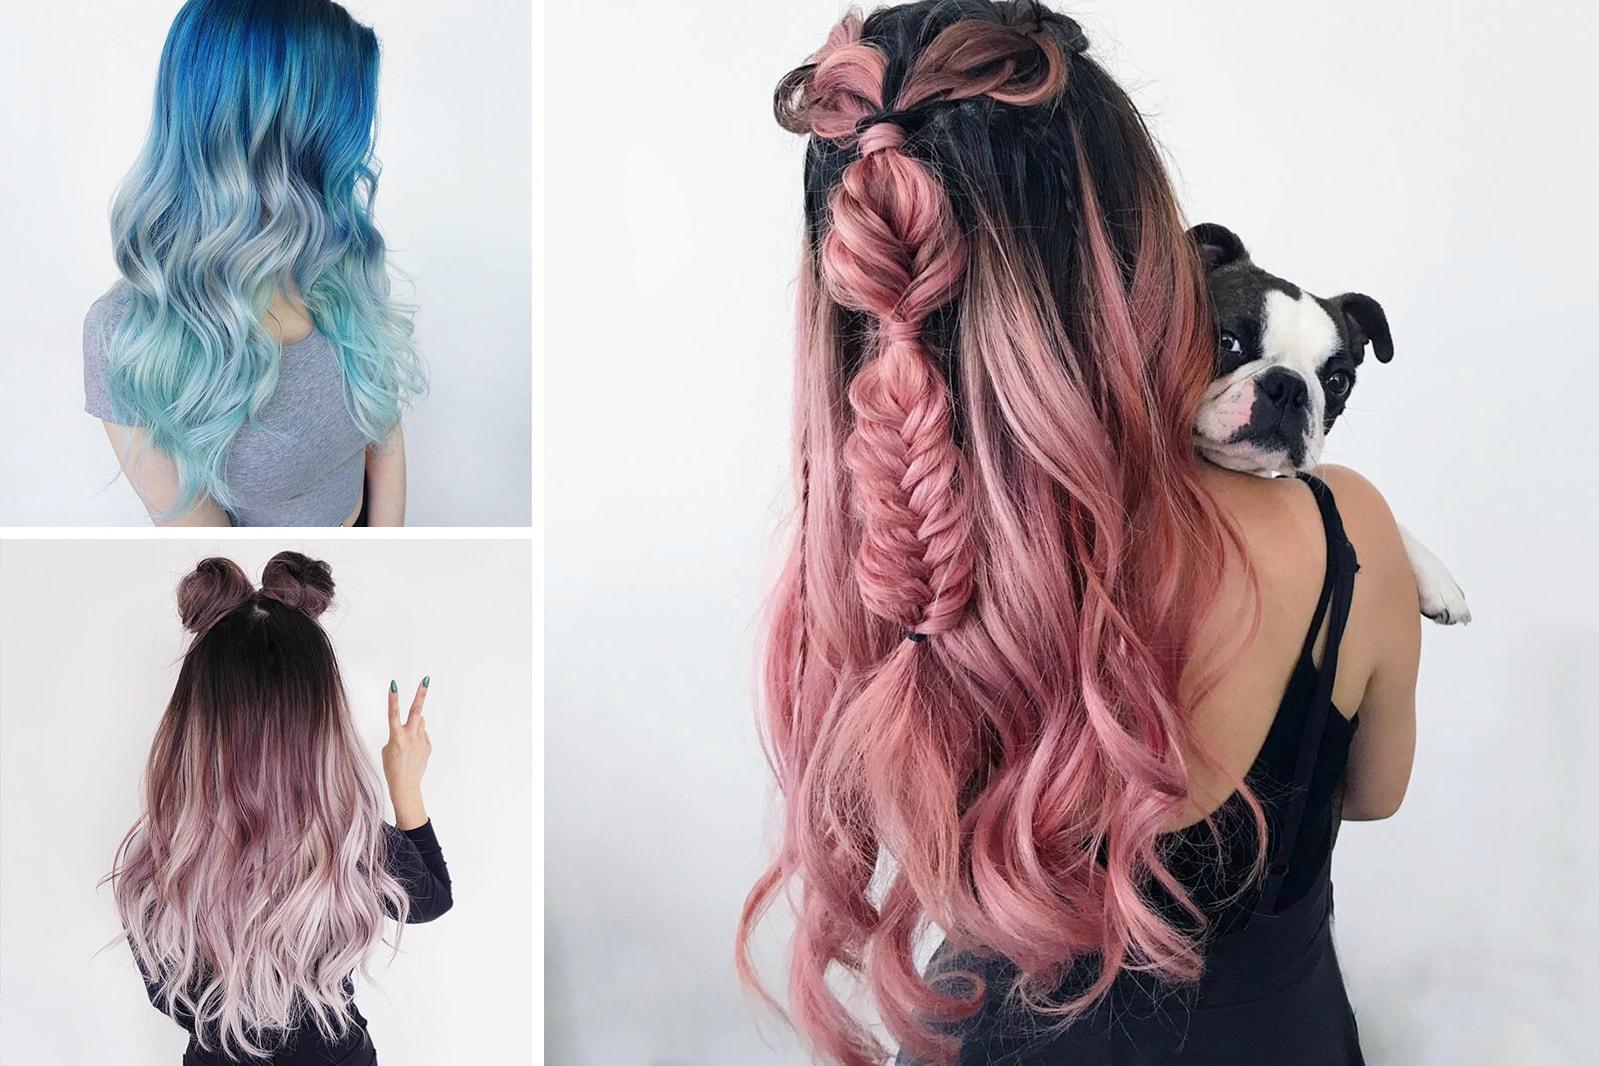 HYPEBAE Instagram Hairgoals Hairinspo fuck bad Hair Color Unicorn Rainbow Pastel snitchery ninautashiro fuhzz notep